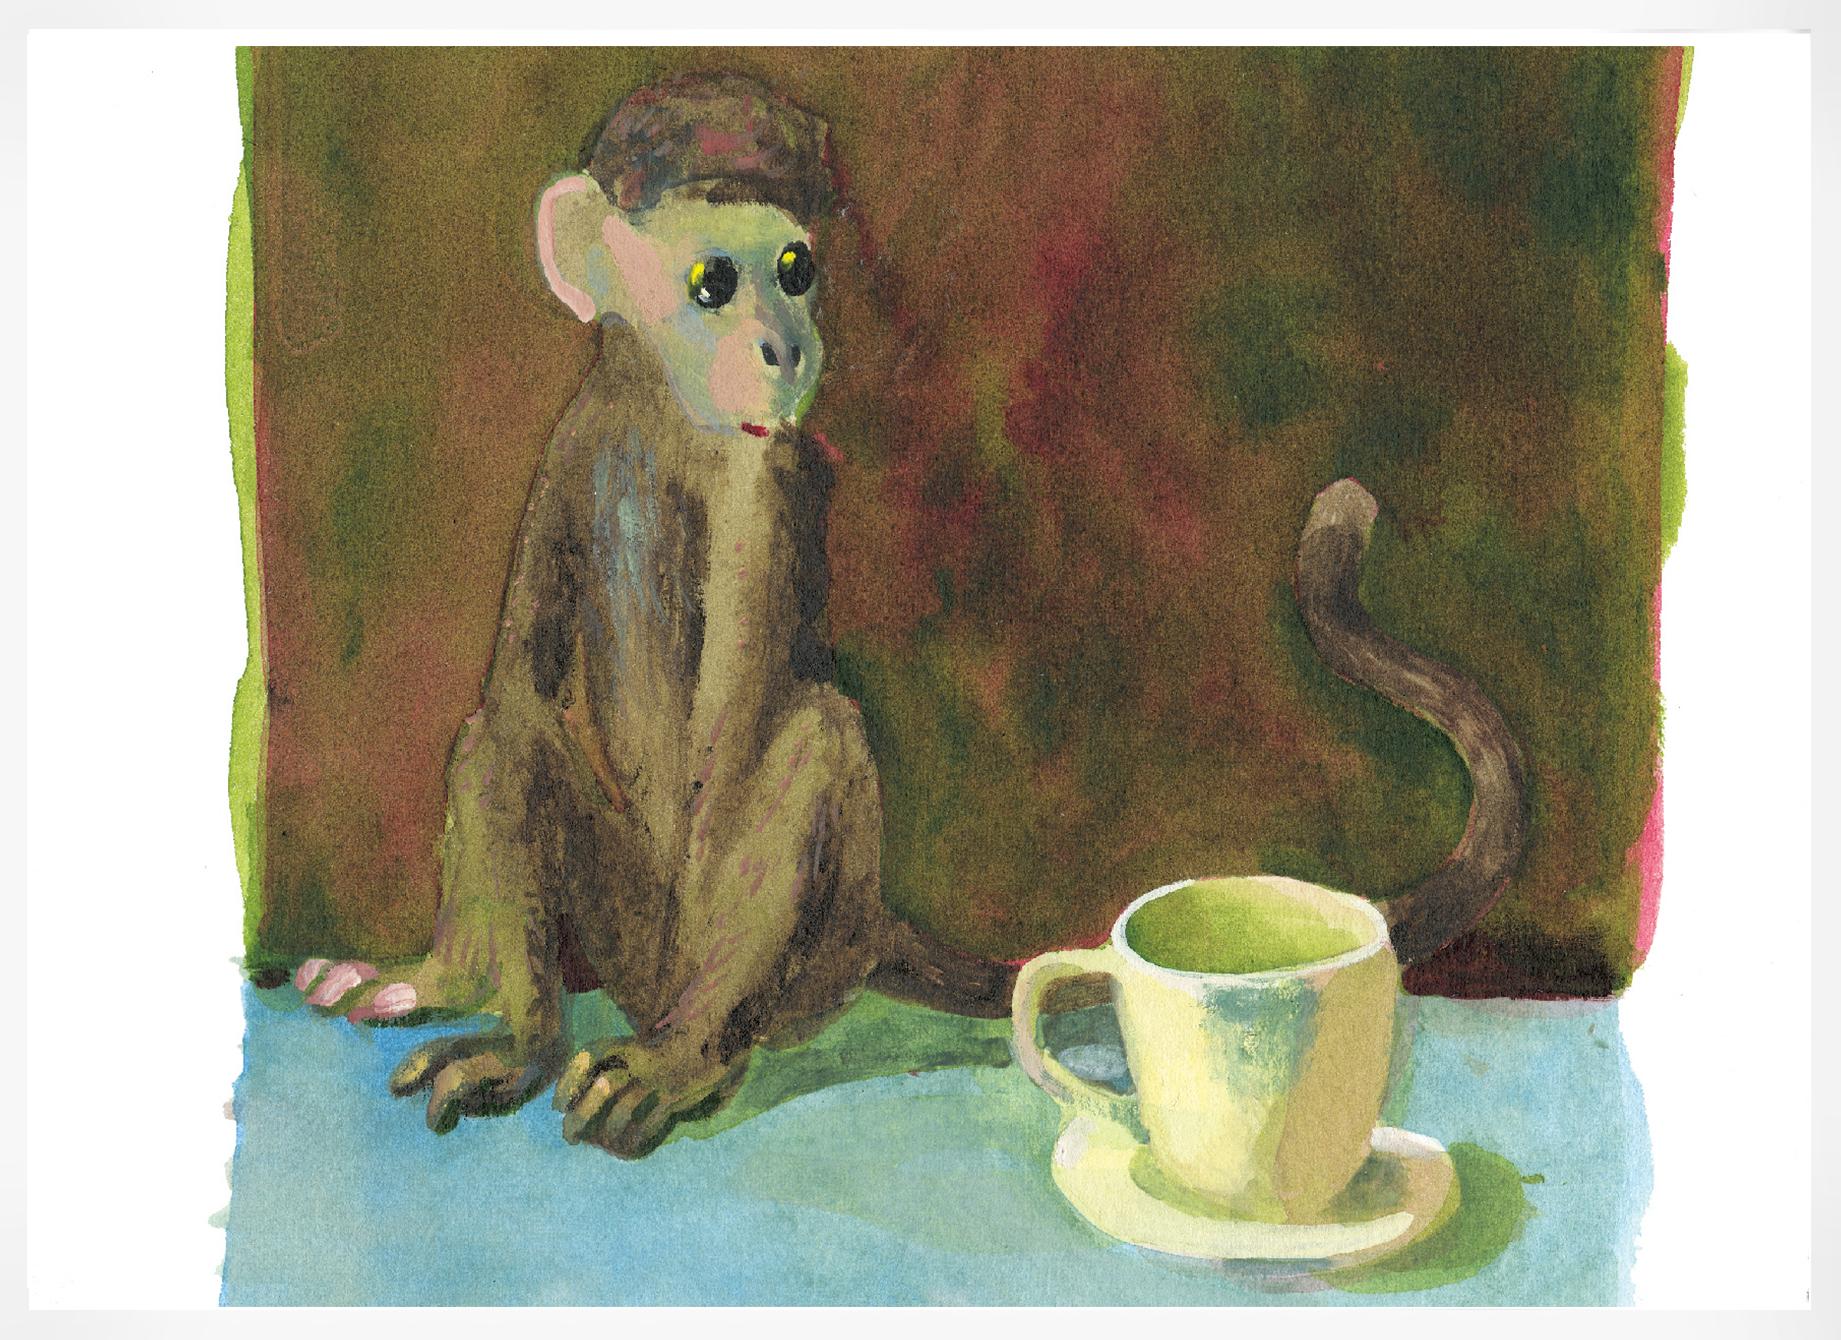 Monkey and teacup.jpg